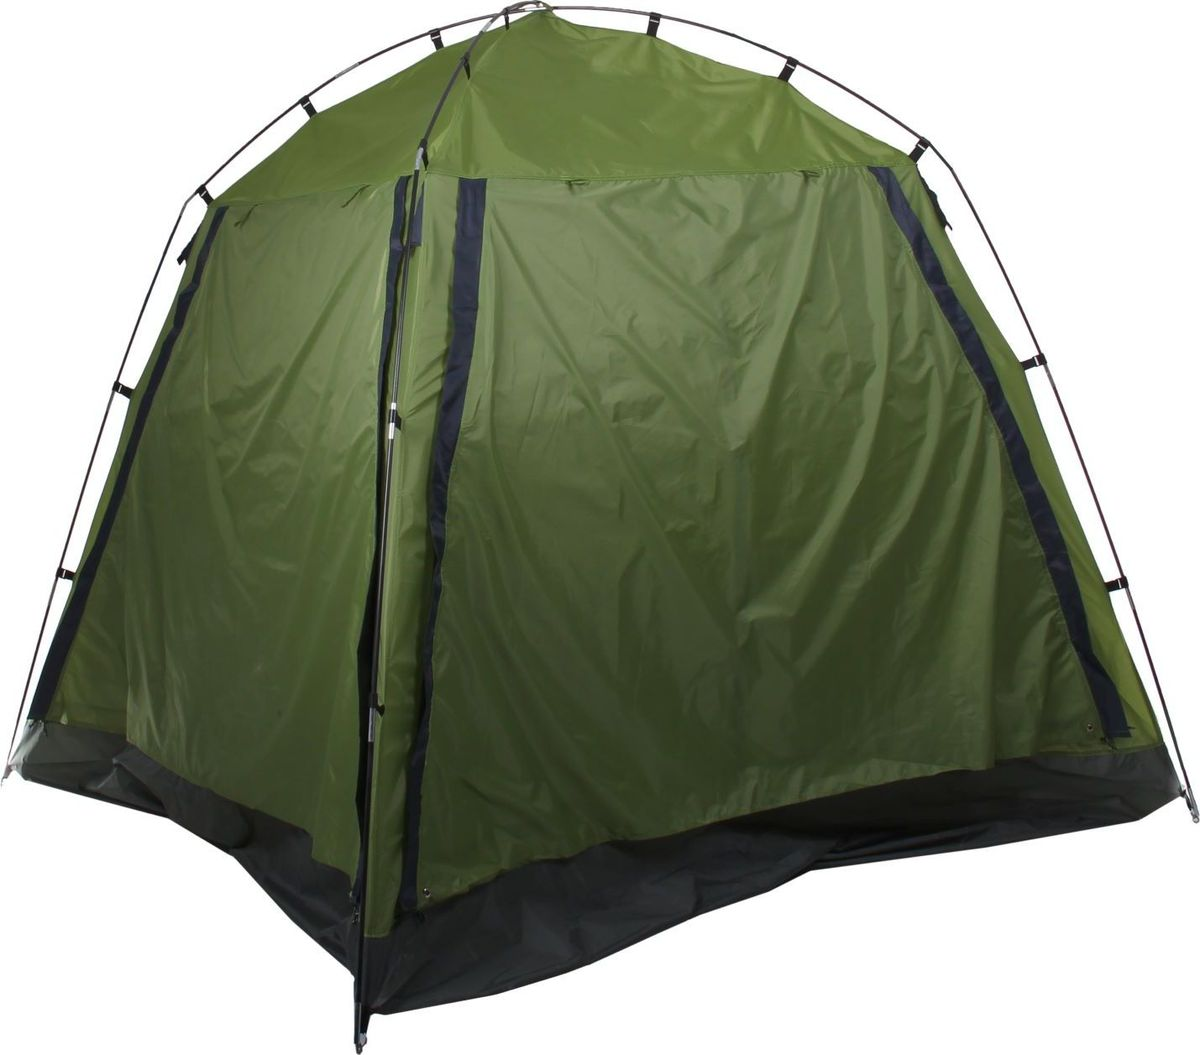 Шатер, со стенками, цвет: зеленый, 220 х 220 х 180 см - Мебель для отдыха